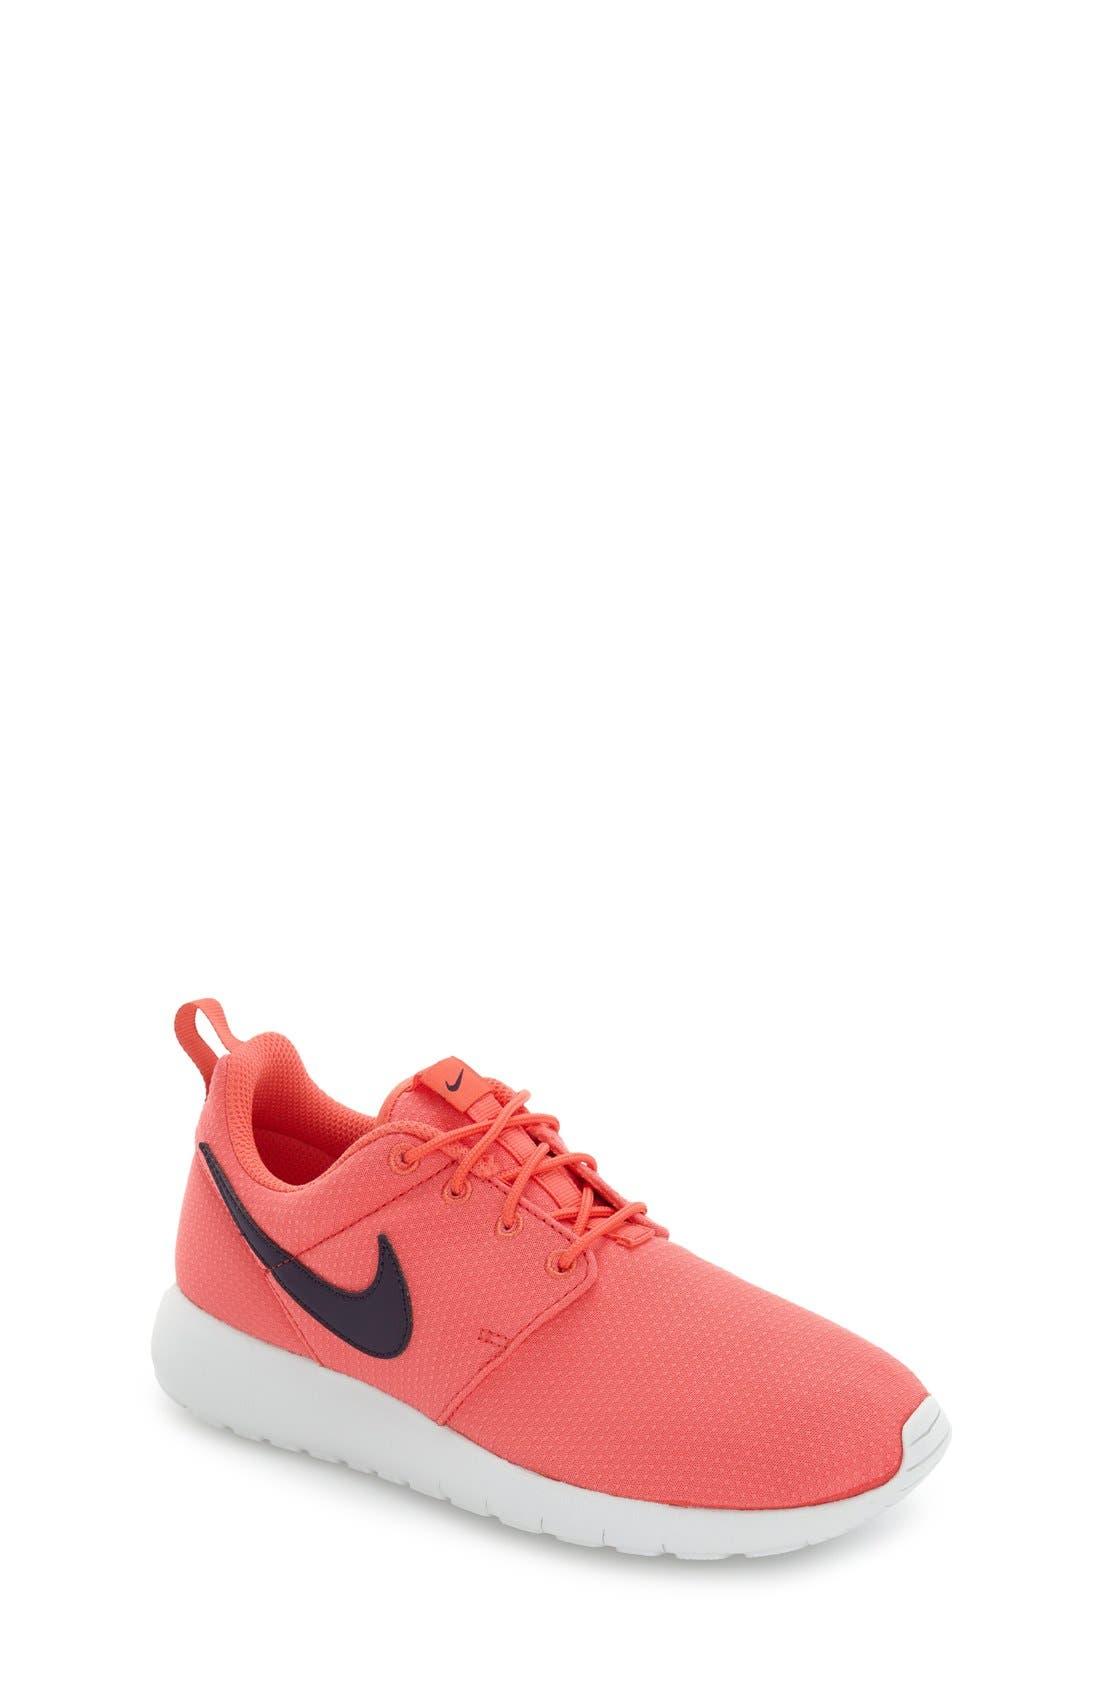 'Roshe Run' Athletic Shoe,                             Main thumbnail 54, color,